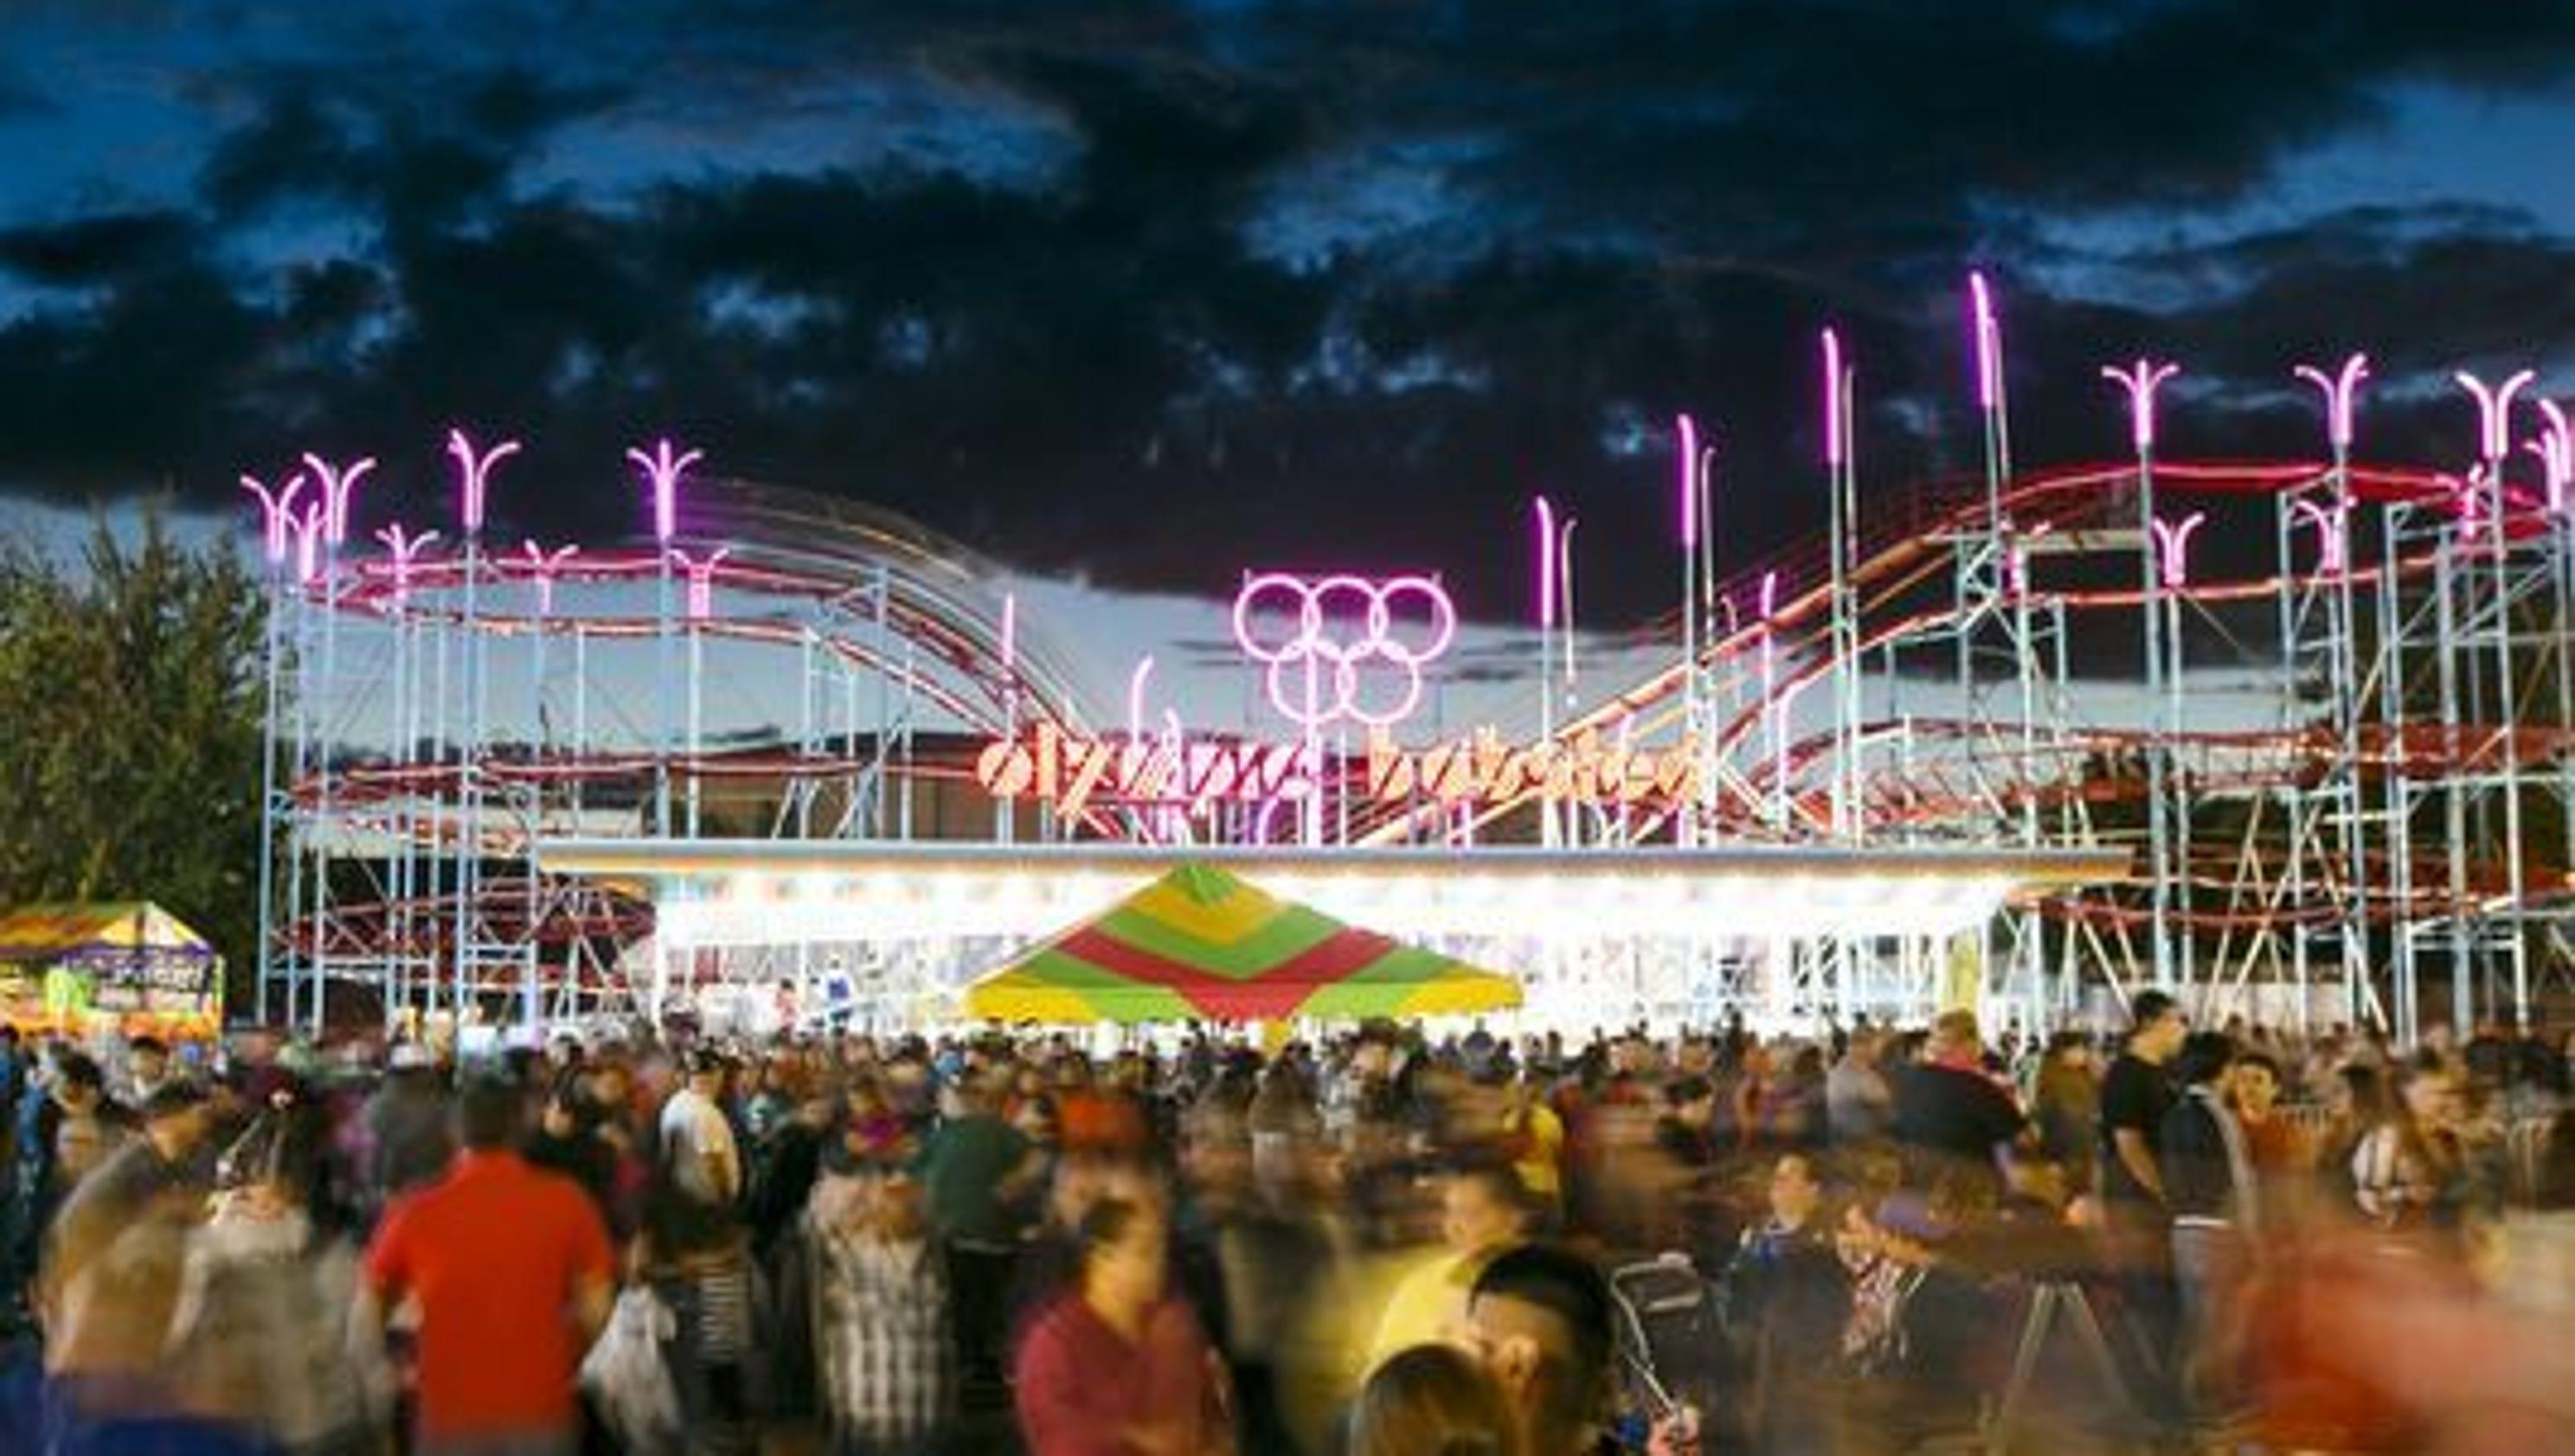 State fair dates in Melbourne